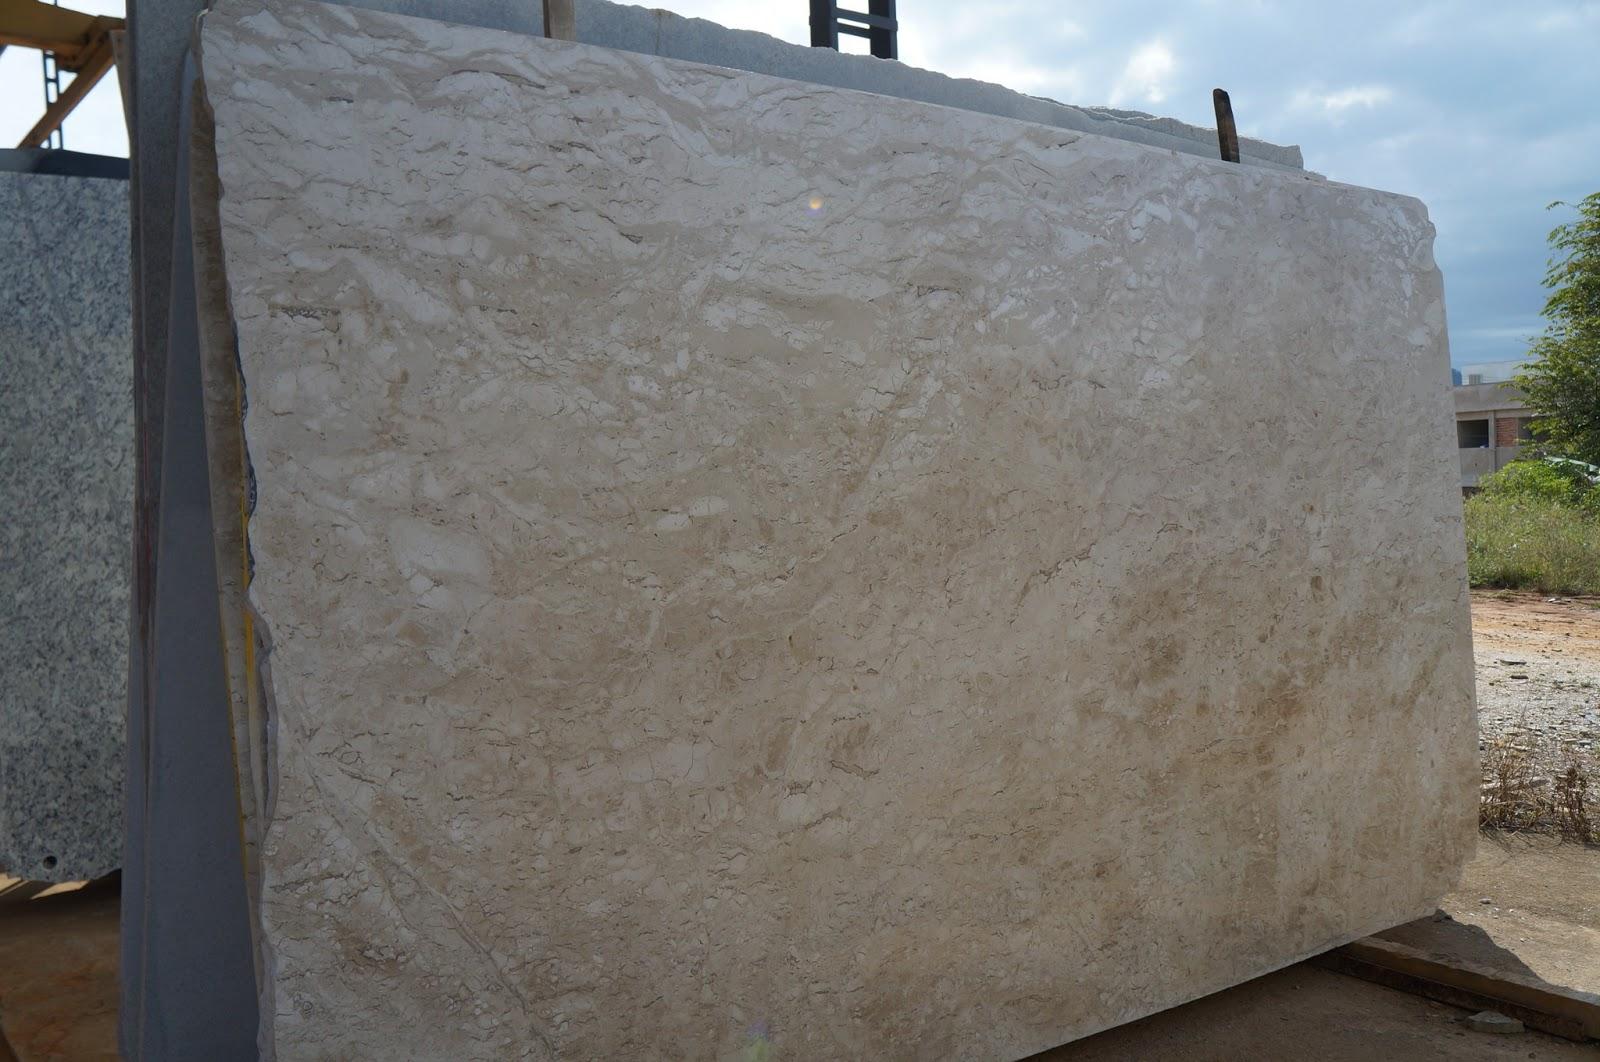 Polimax Granitos Ldta Travertino Bege Bahia 0 2